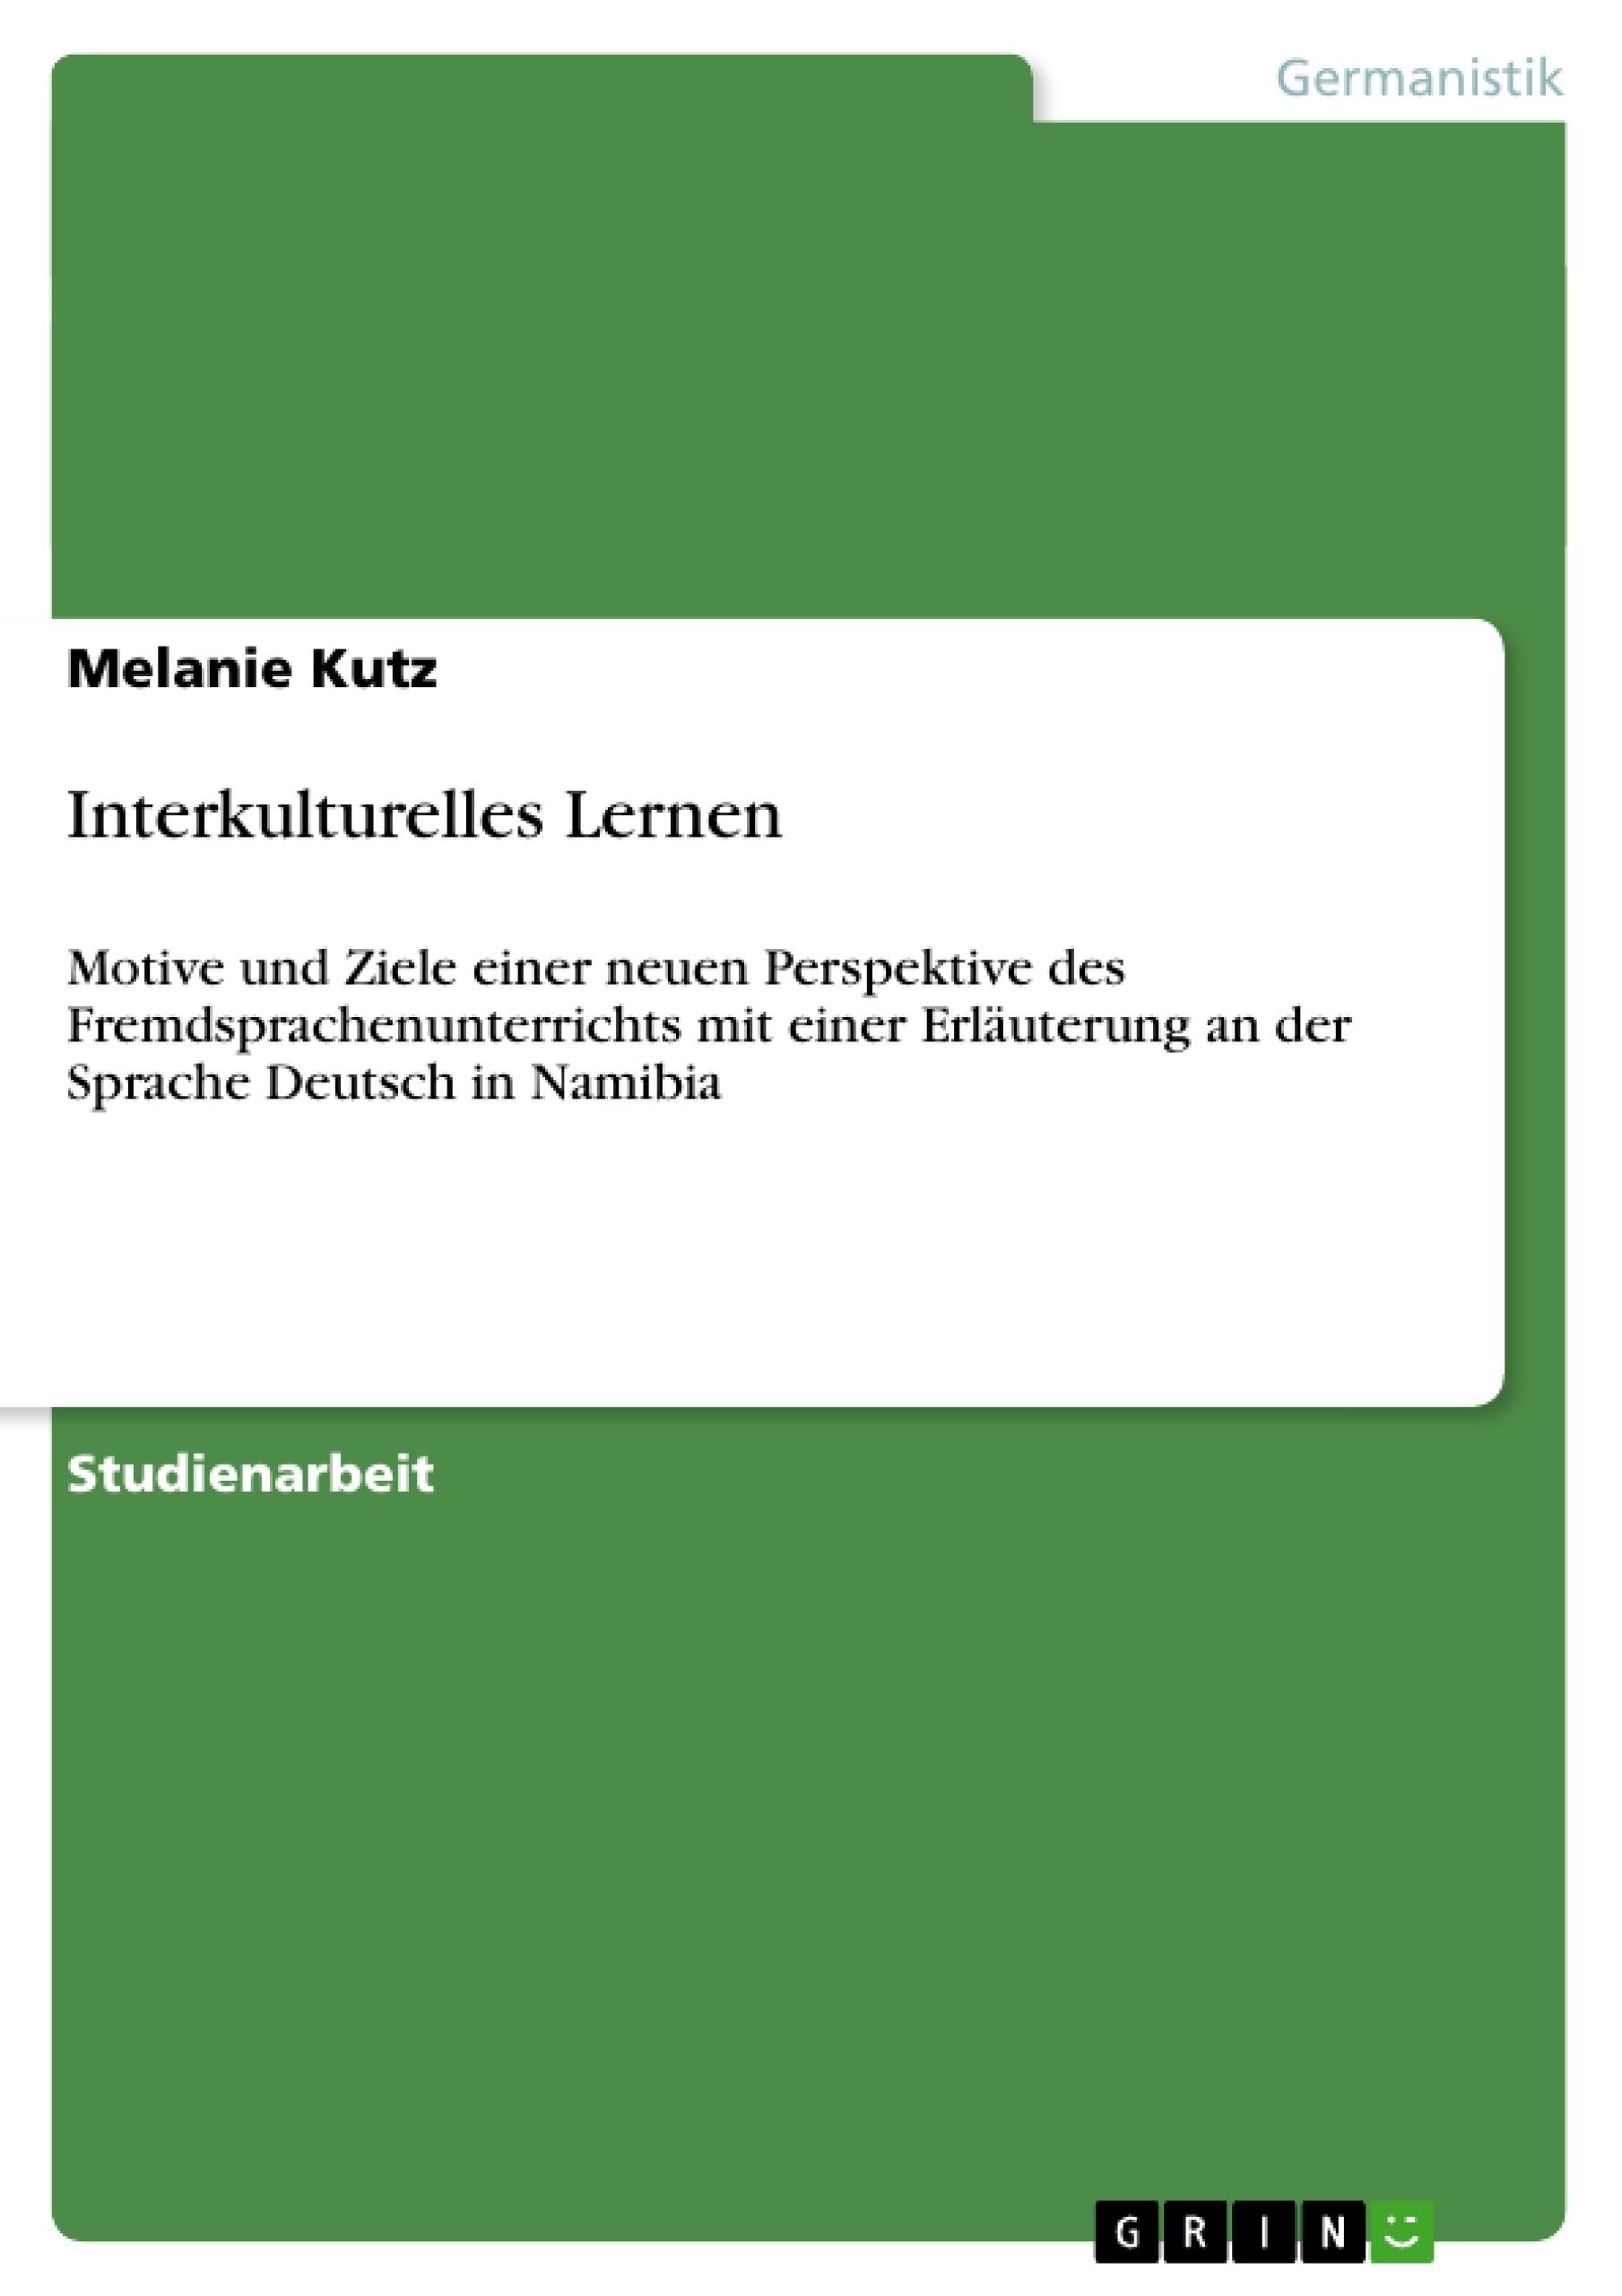 Titel: Interkulturelles Lernen